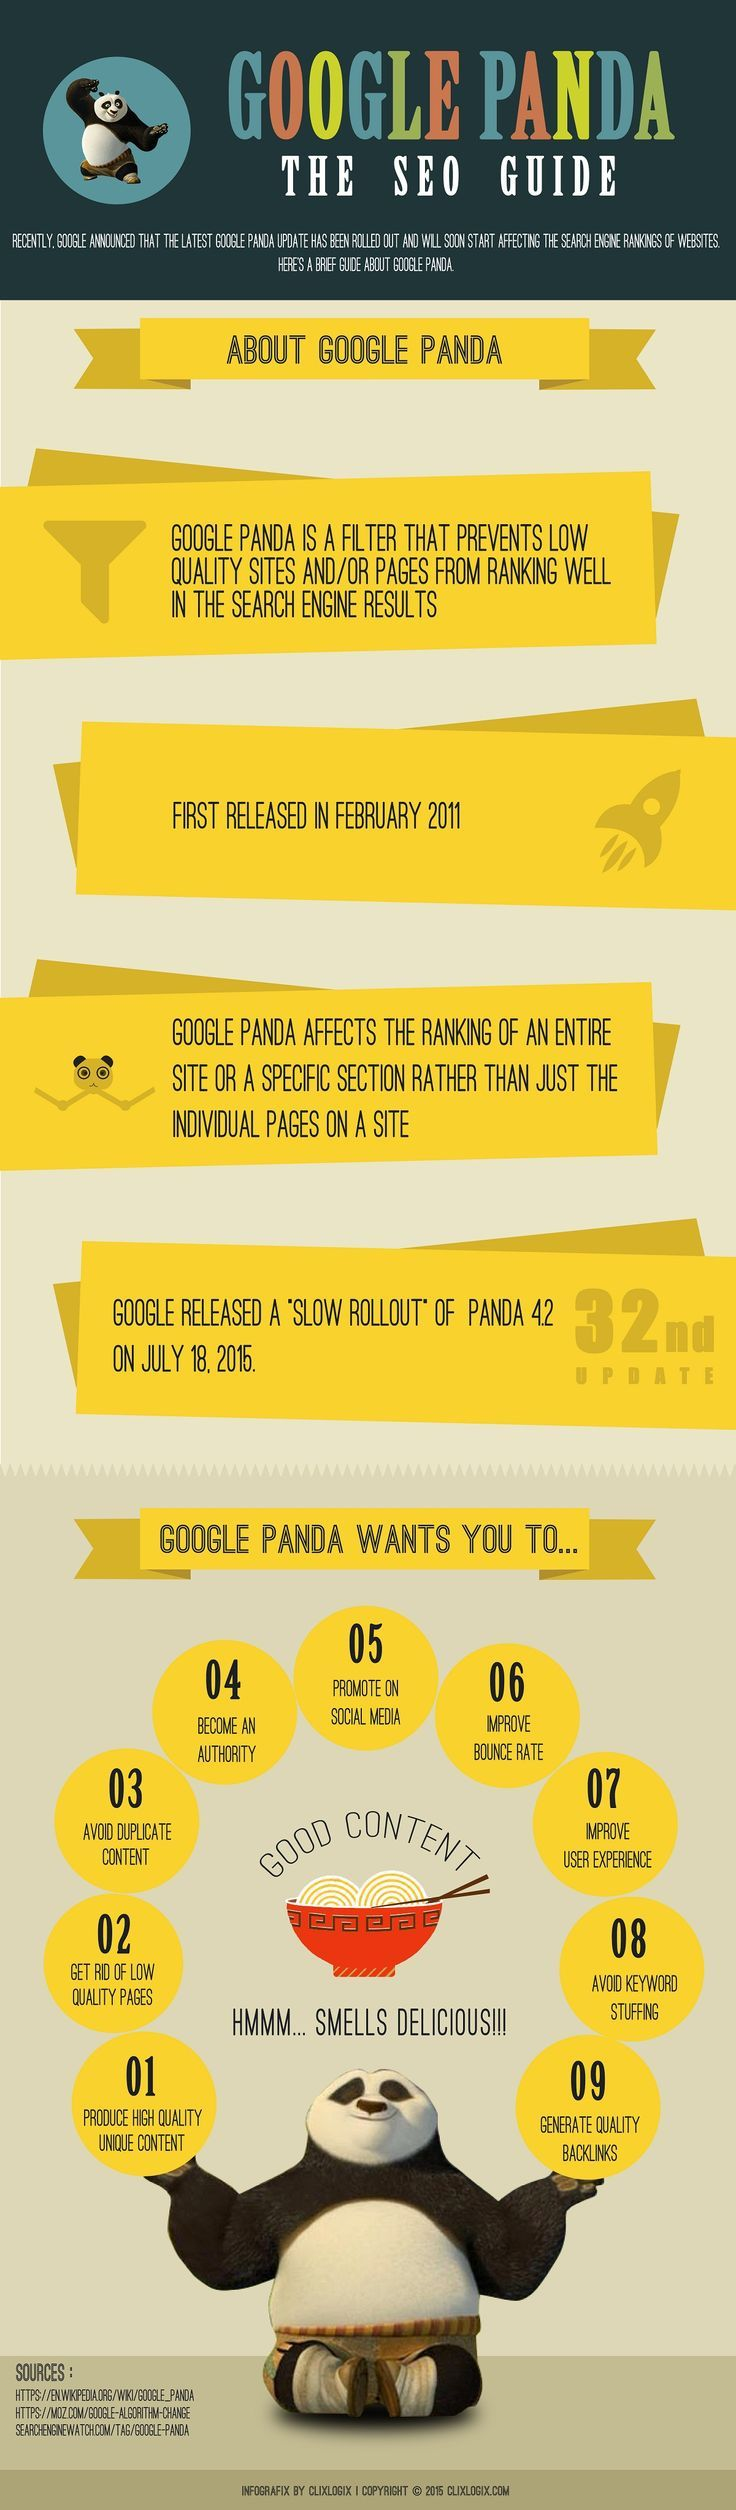 Advertising-Infographics-Finally-Easy-to-Understand-Google-Panda-The-SEO-Guide-via-semanticmastery.com Advertising Infographics : Finally Easy to Understand Google Panda: The SEO Guide via semanticmastery.com #...